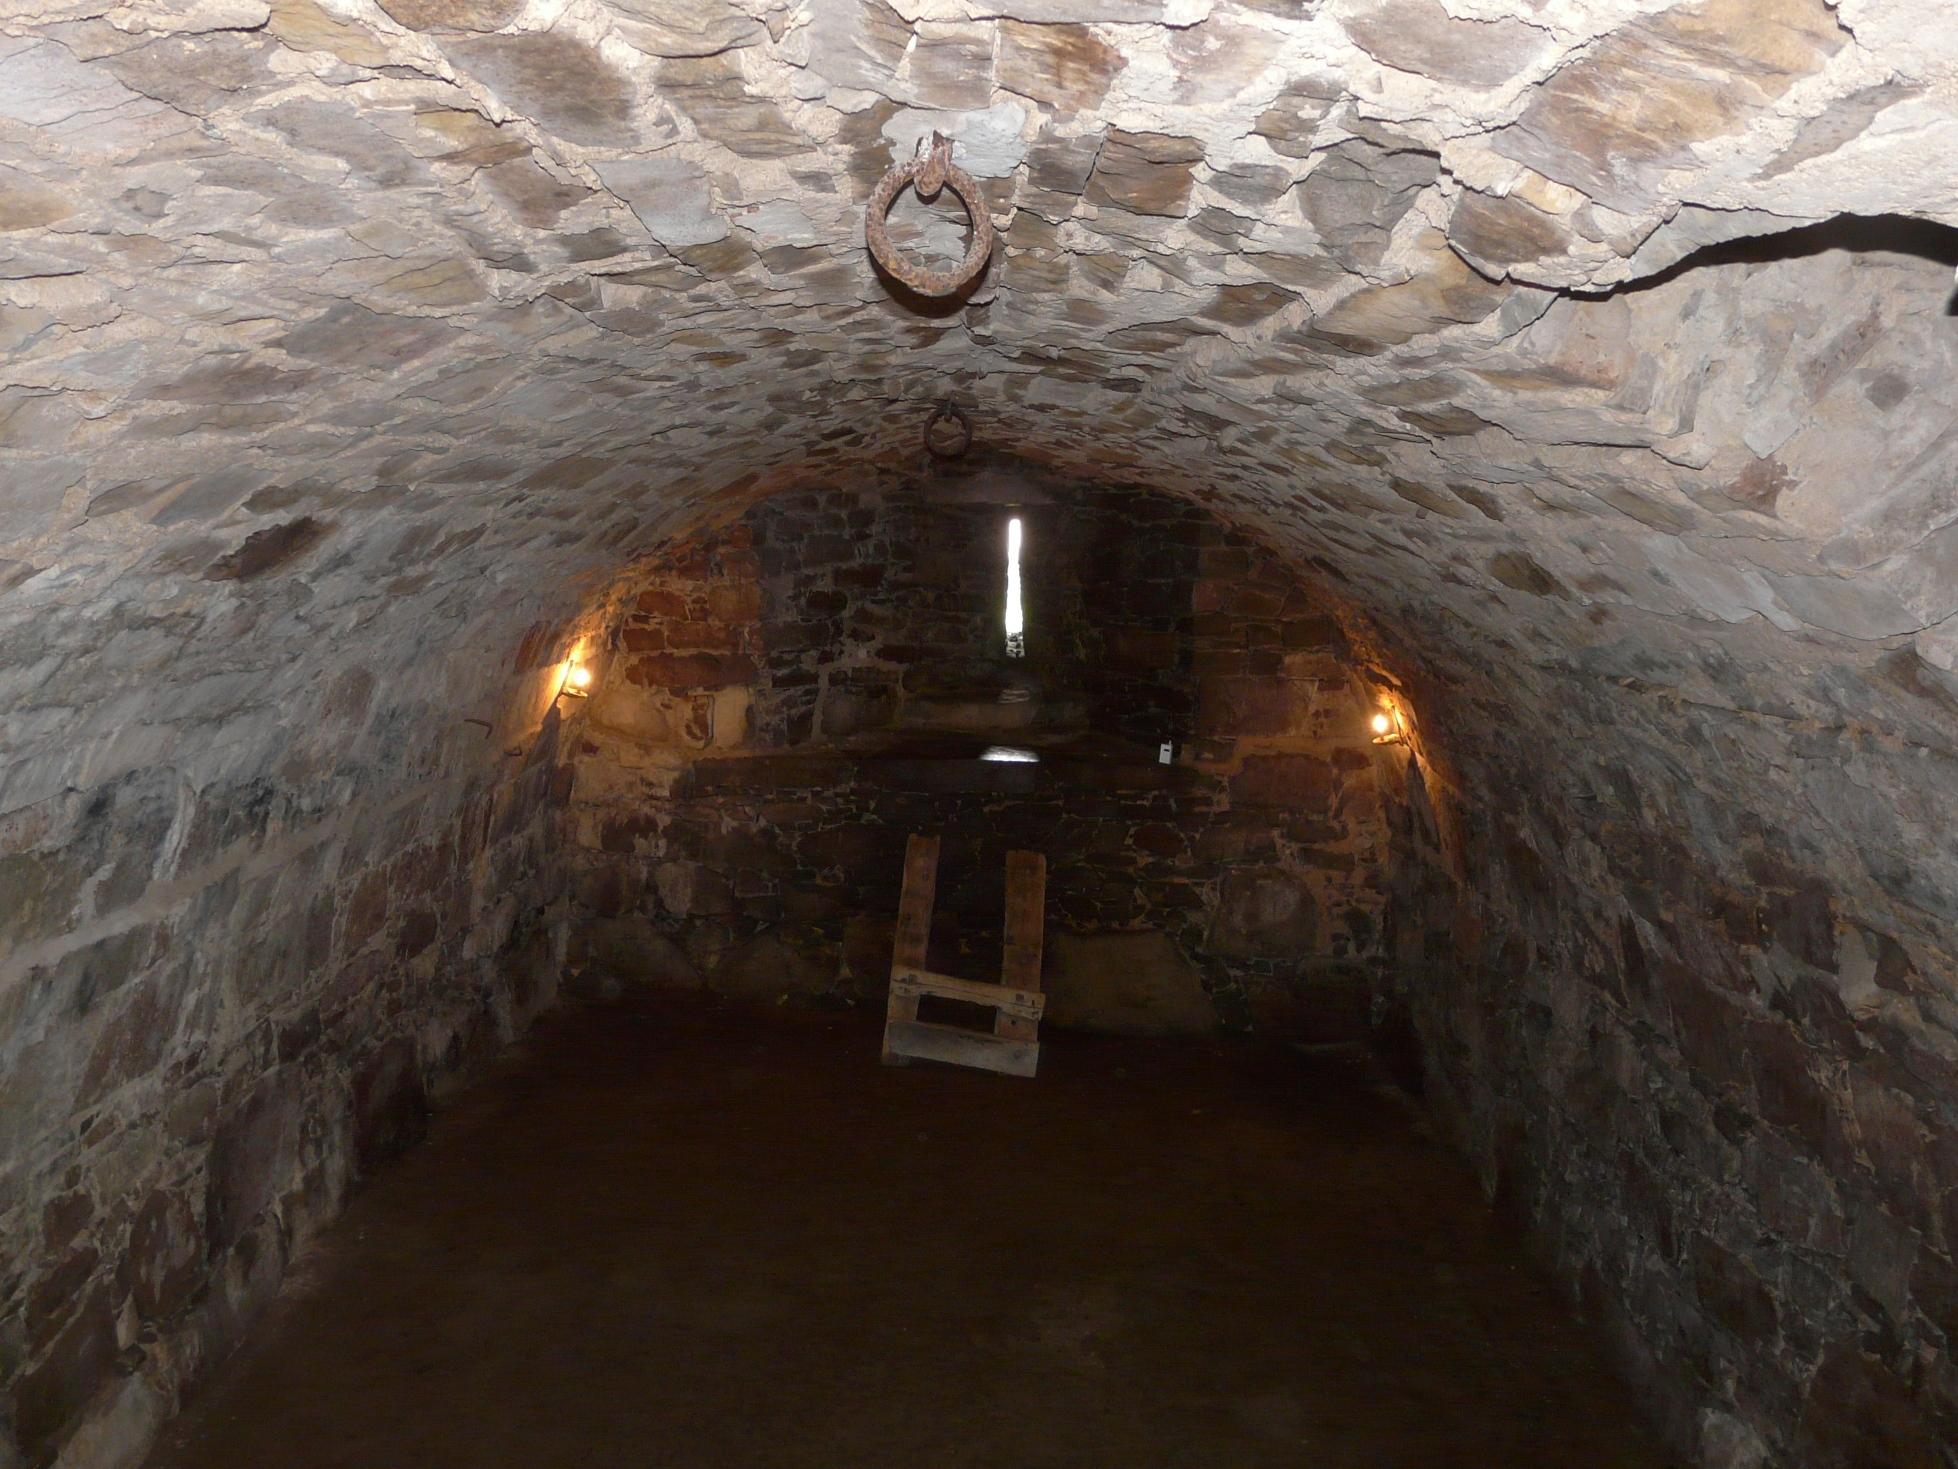 Drum Castle's cellar - its very own bat cave